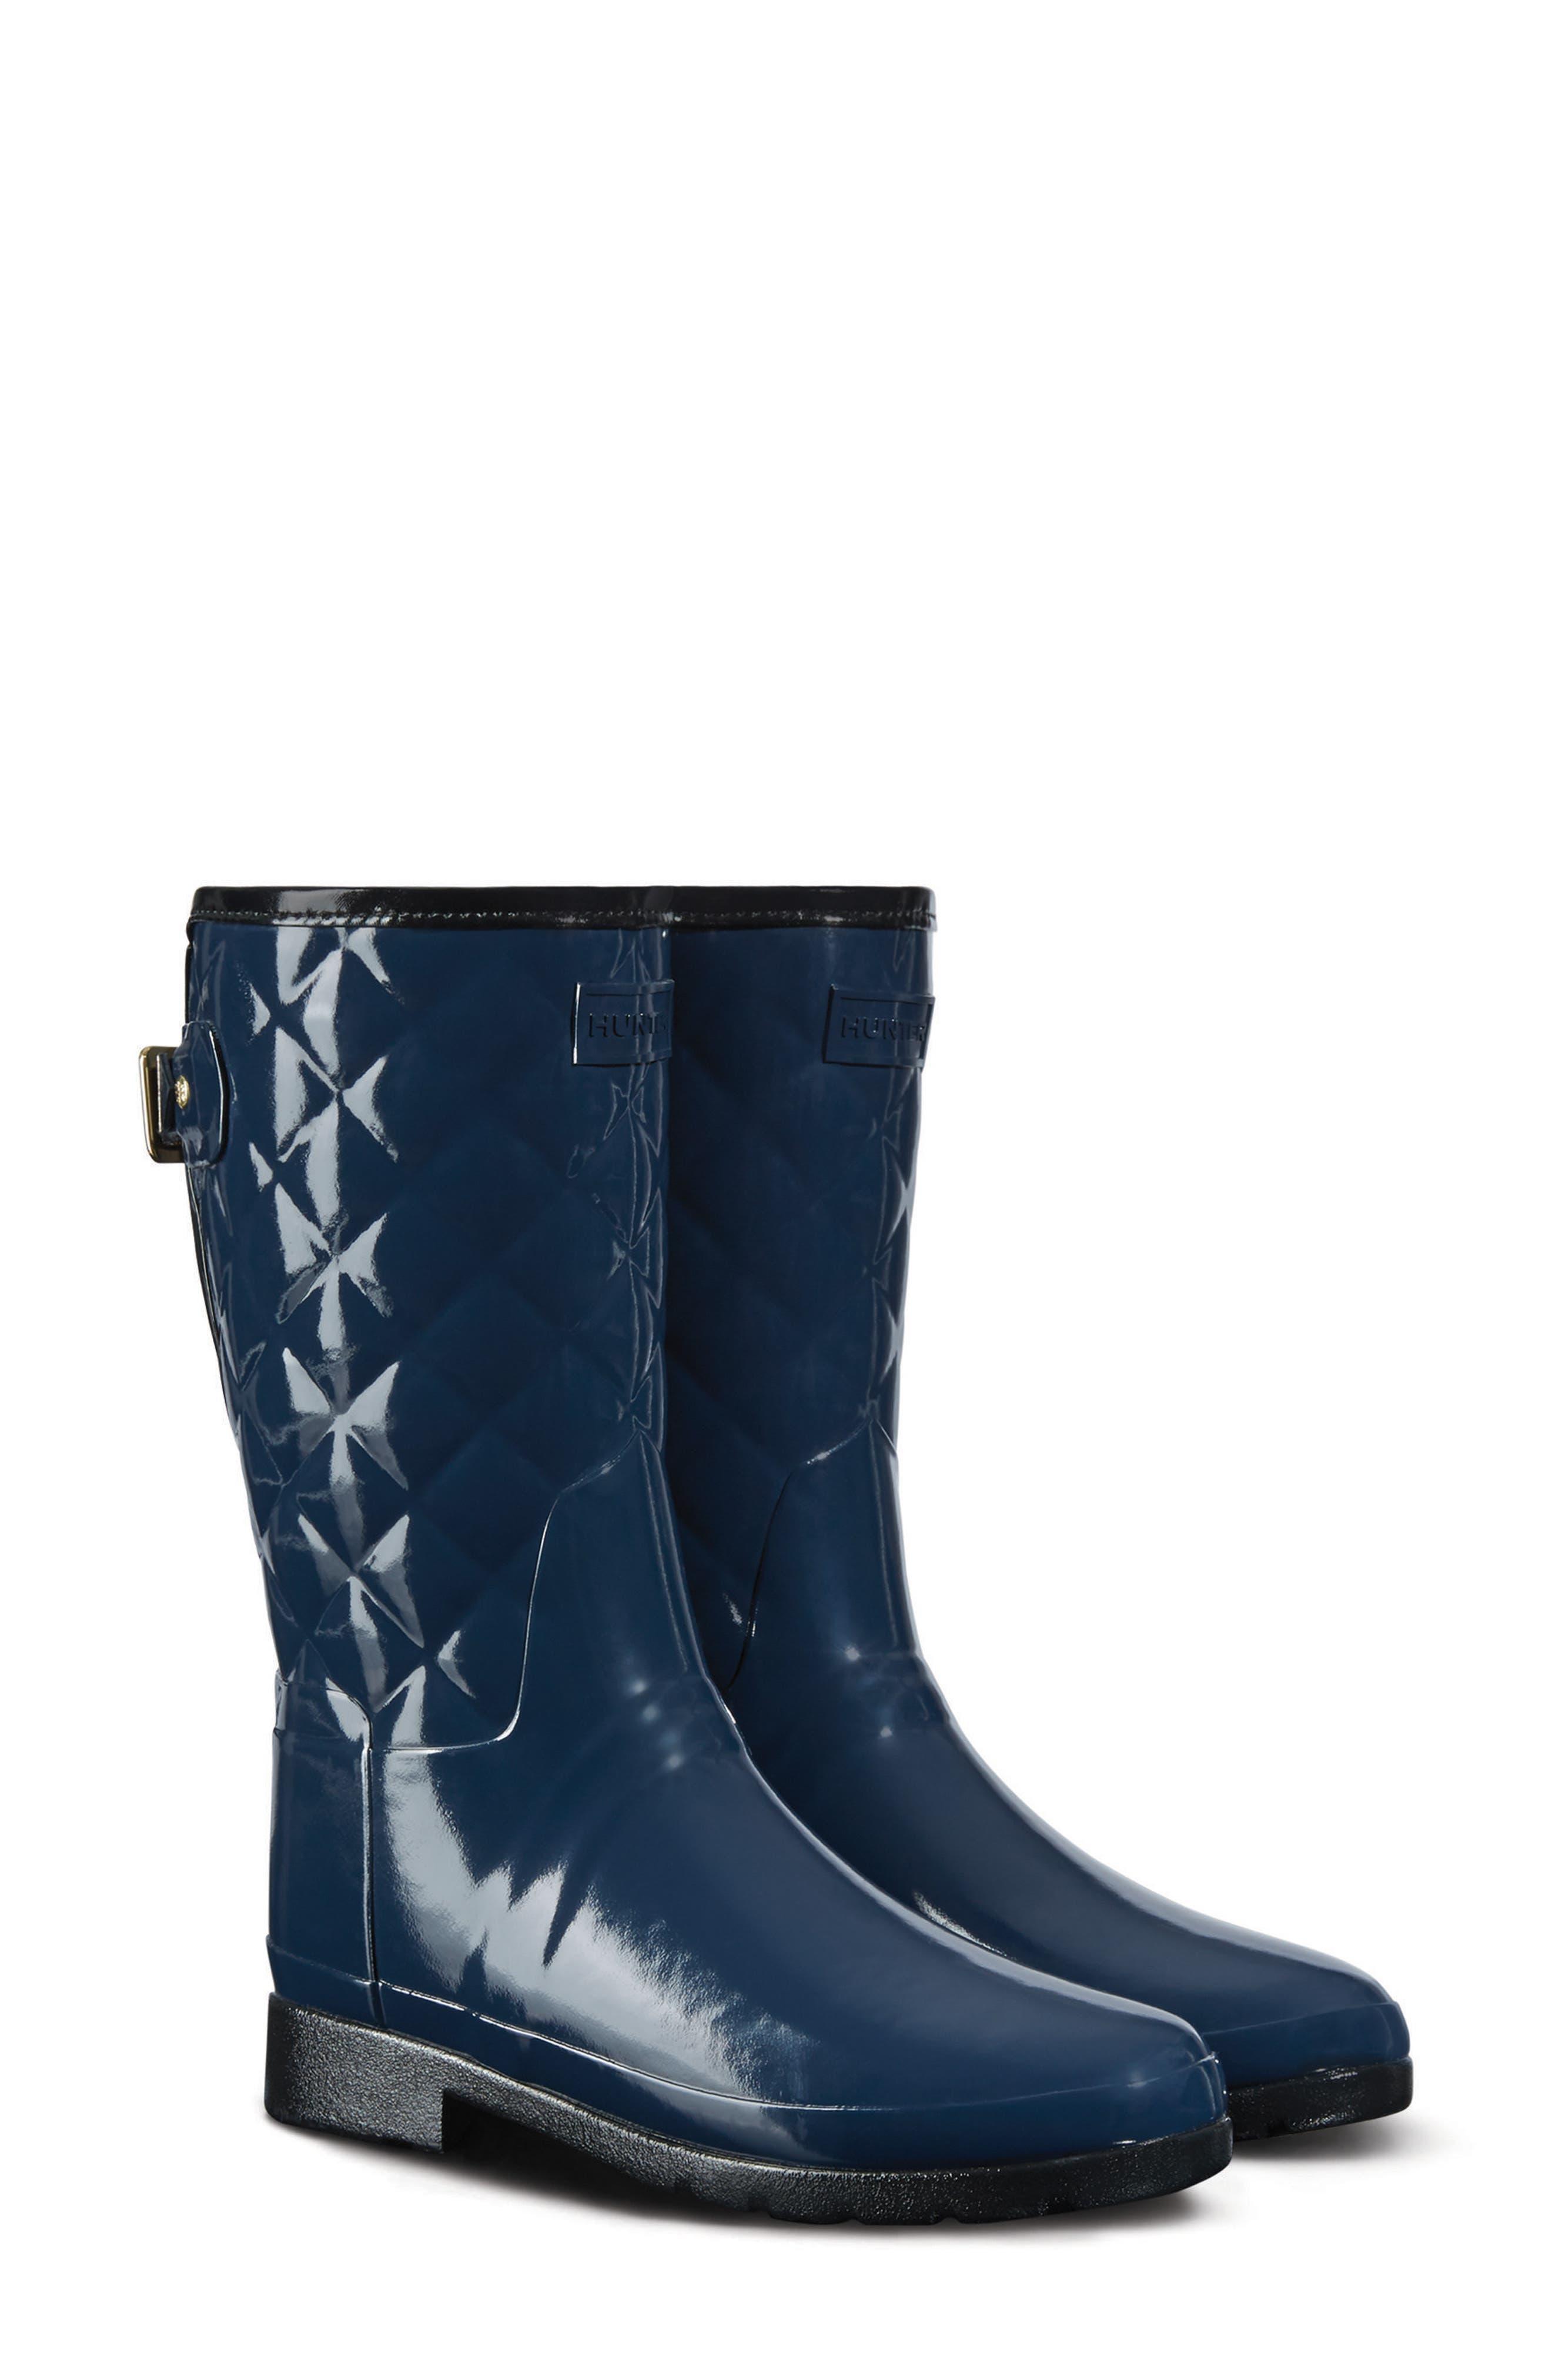 Main Image - Hunter Refined High Gloss Quilted Short Rain Boot (Women)